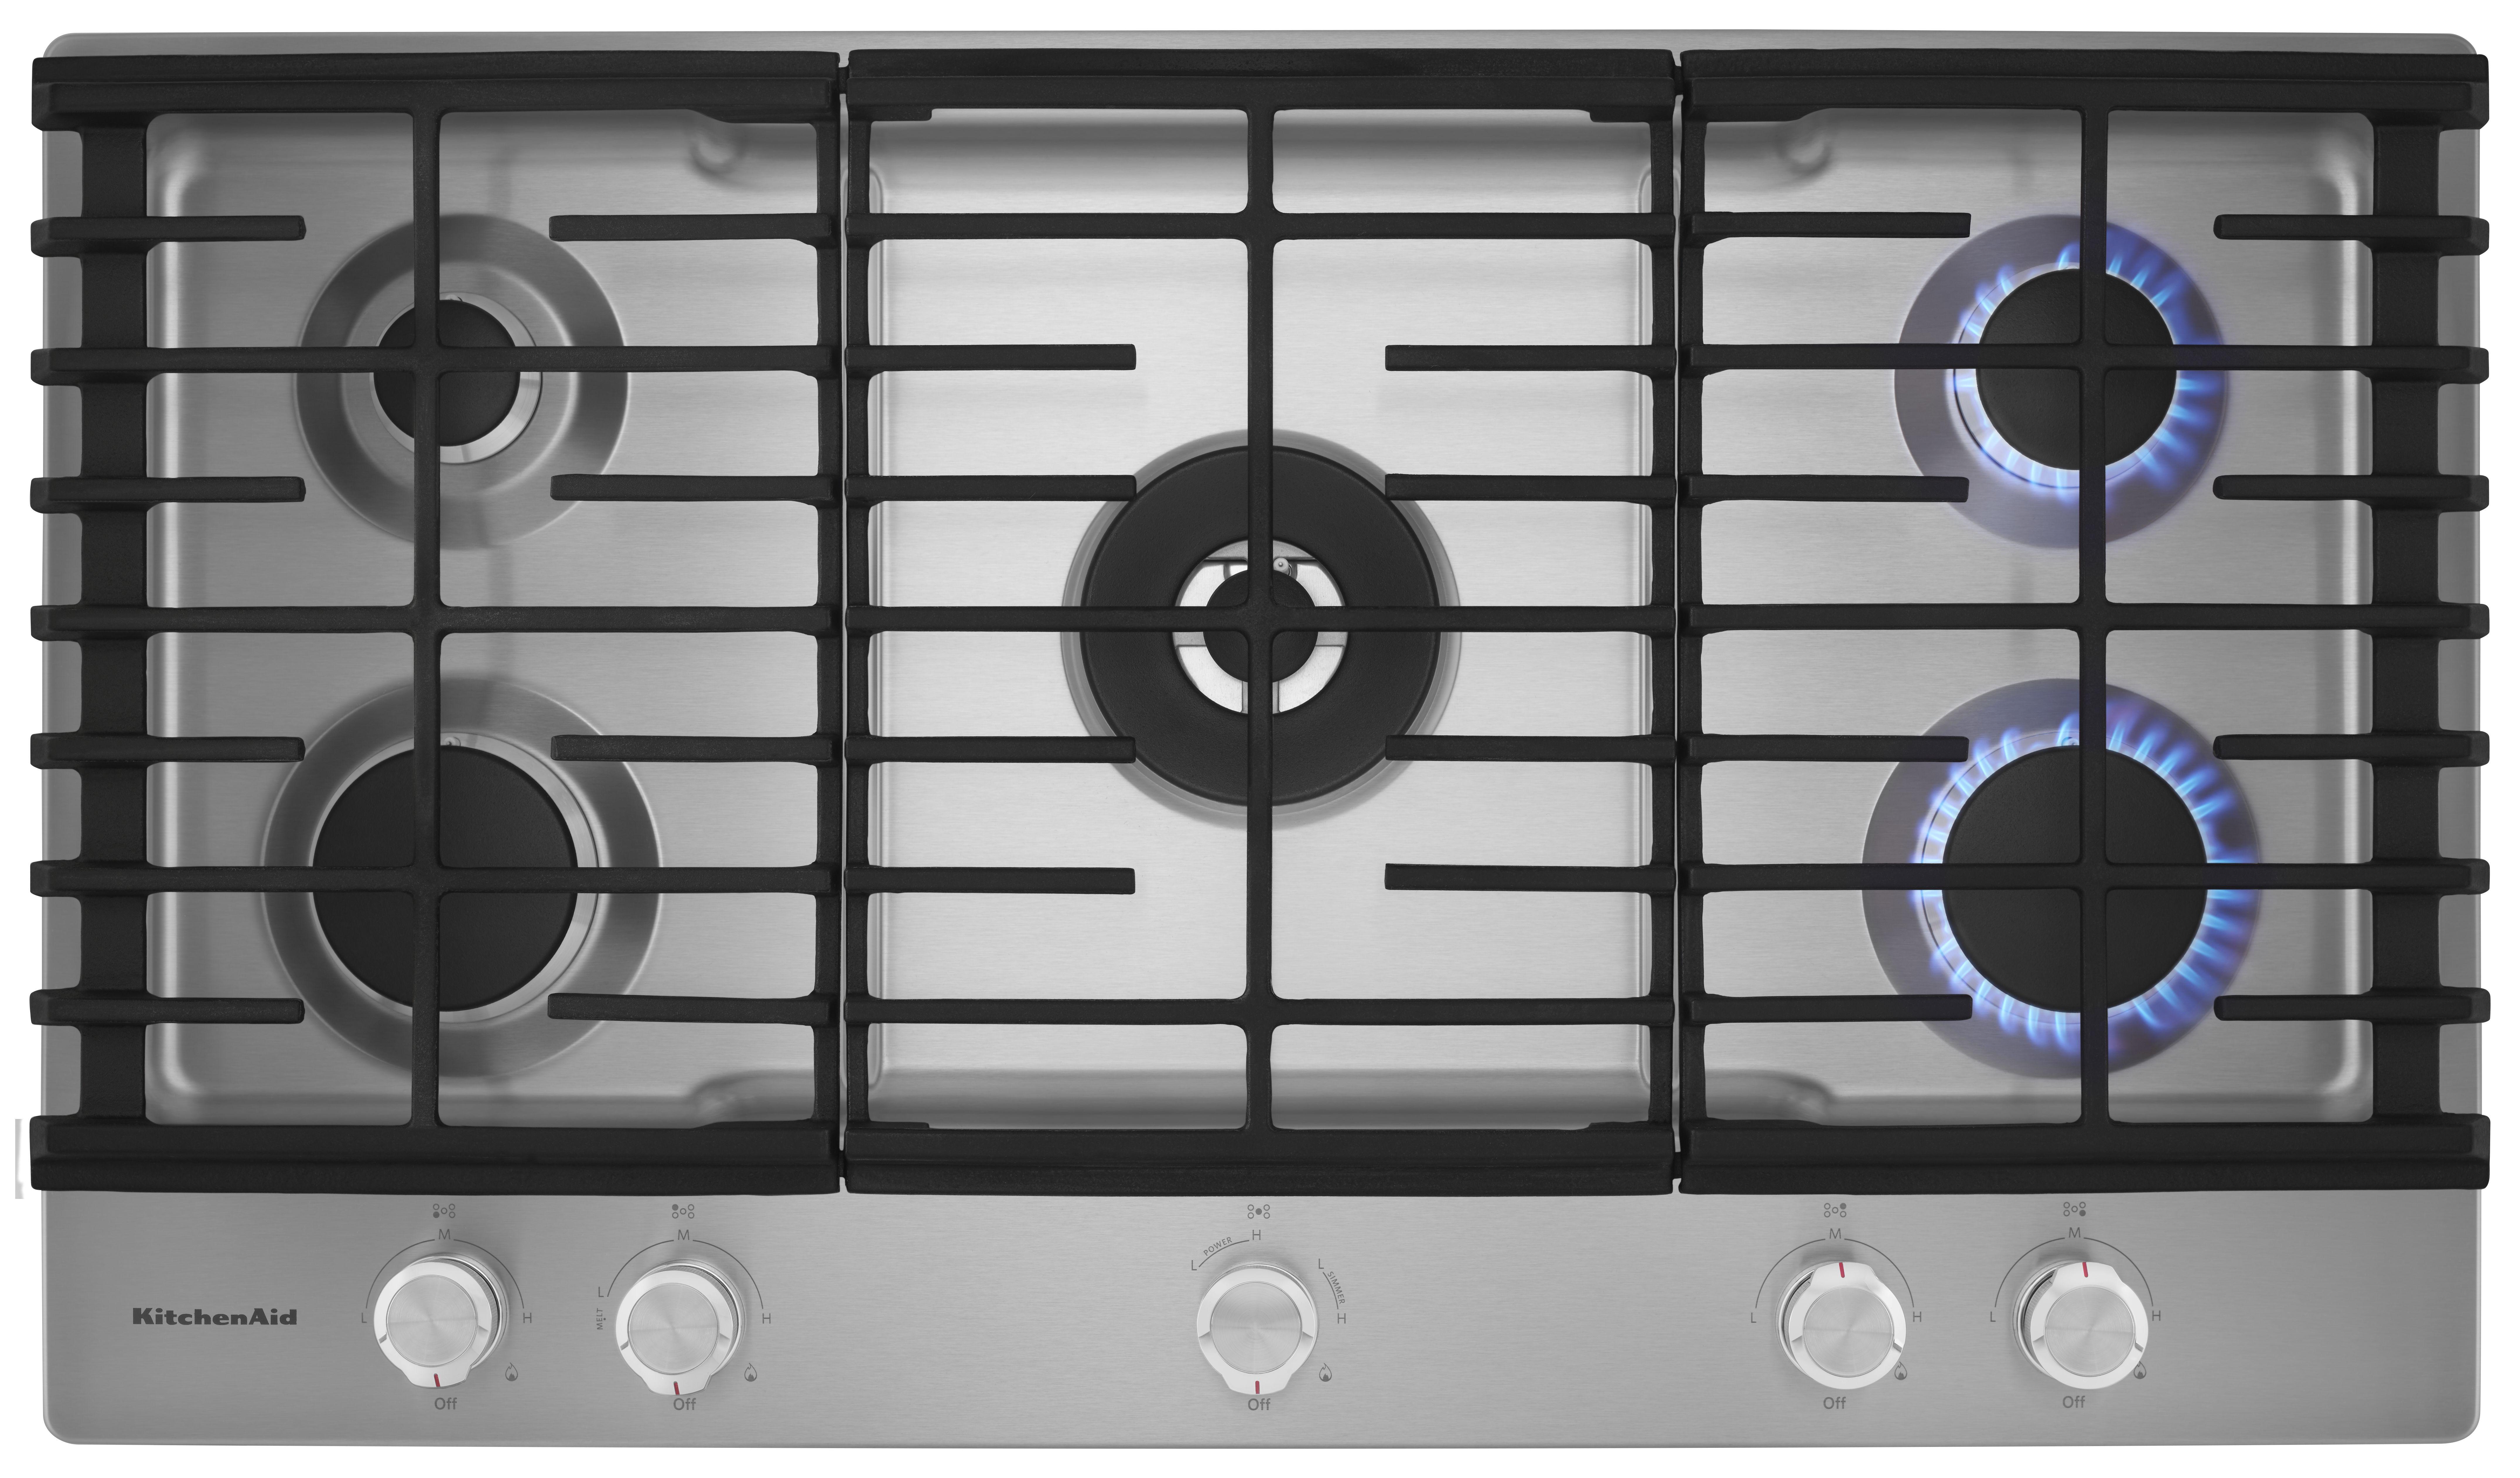 kitchenaid 36 gas rangetop kitchen appliances tips and review